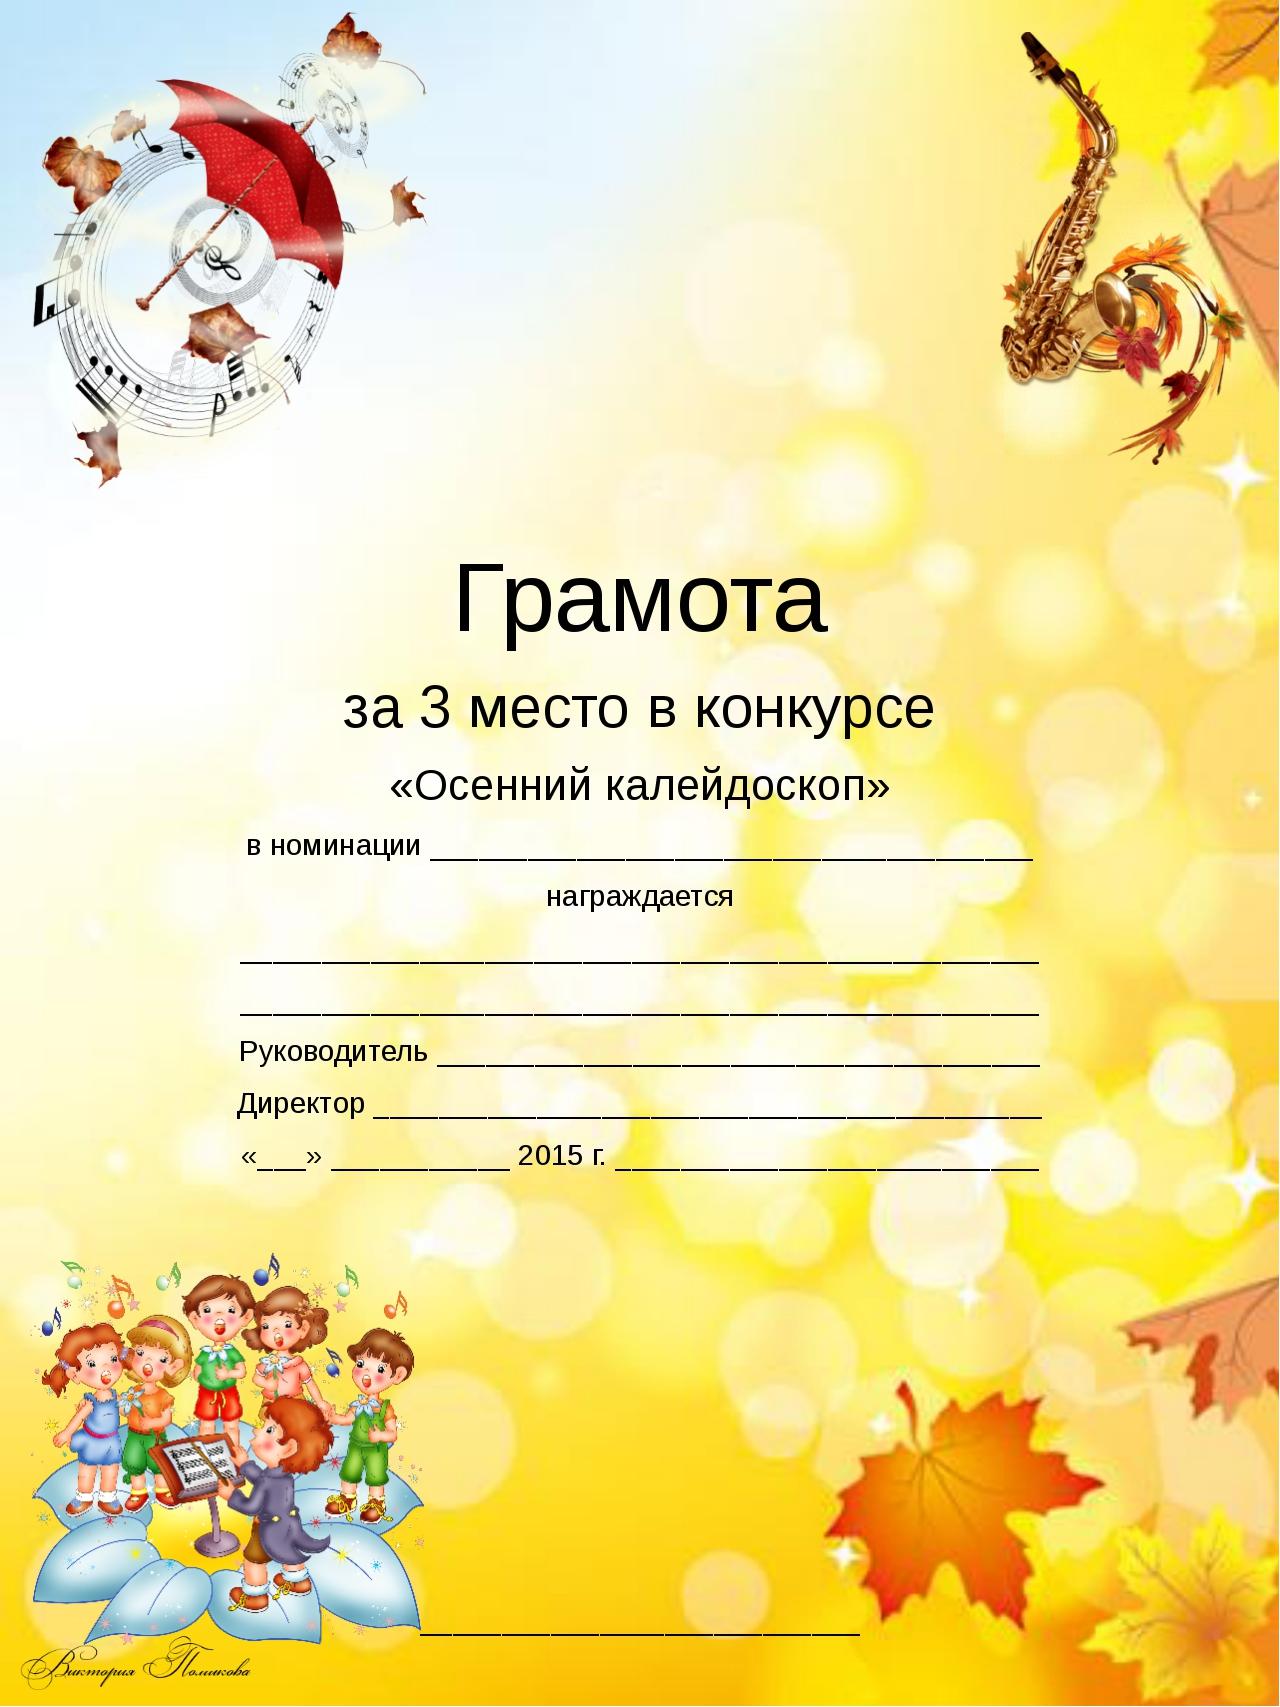 Грамота за 3 место в конкурсе «Осенний калейдоскоп» в номинации _____________...